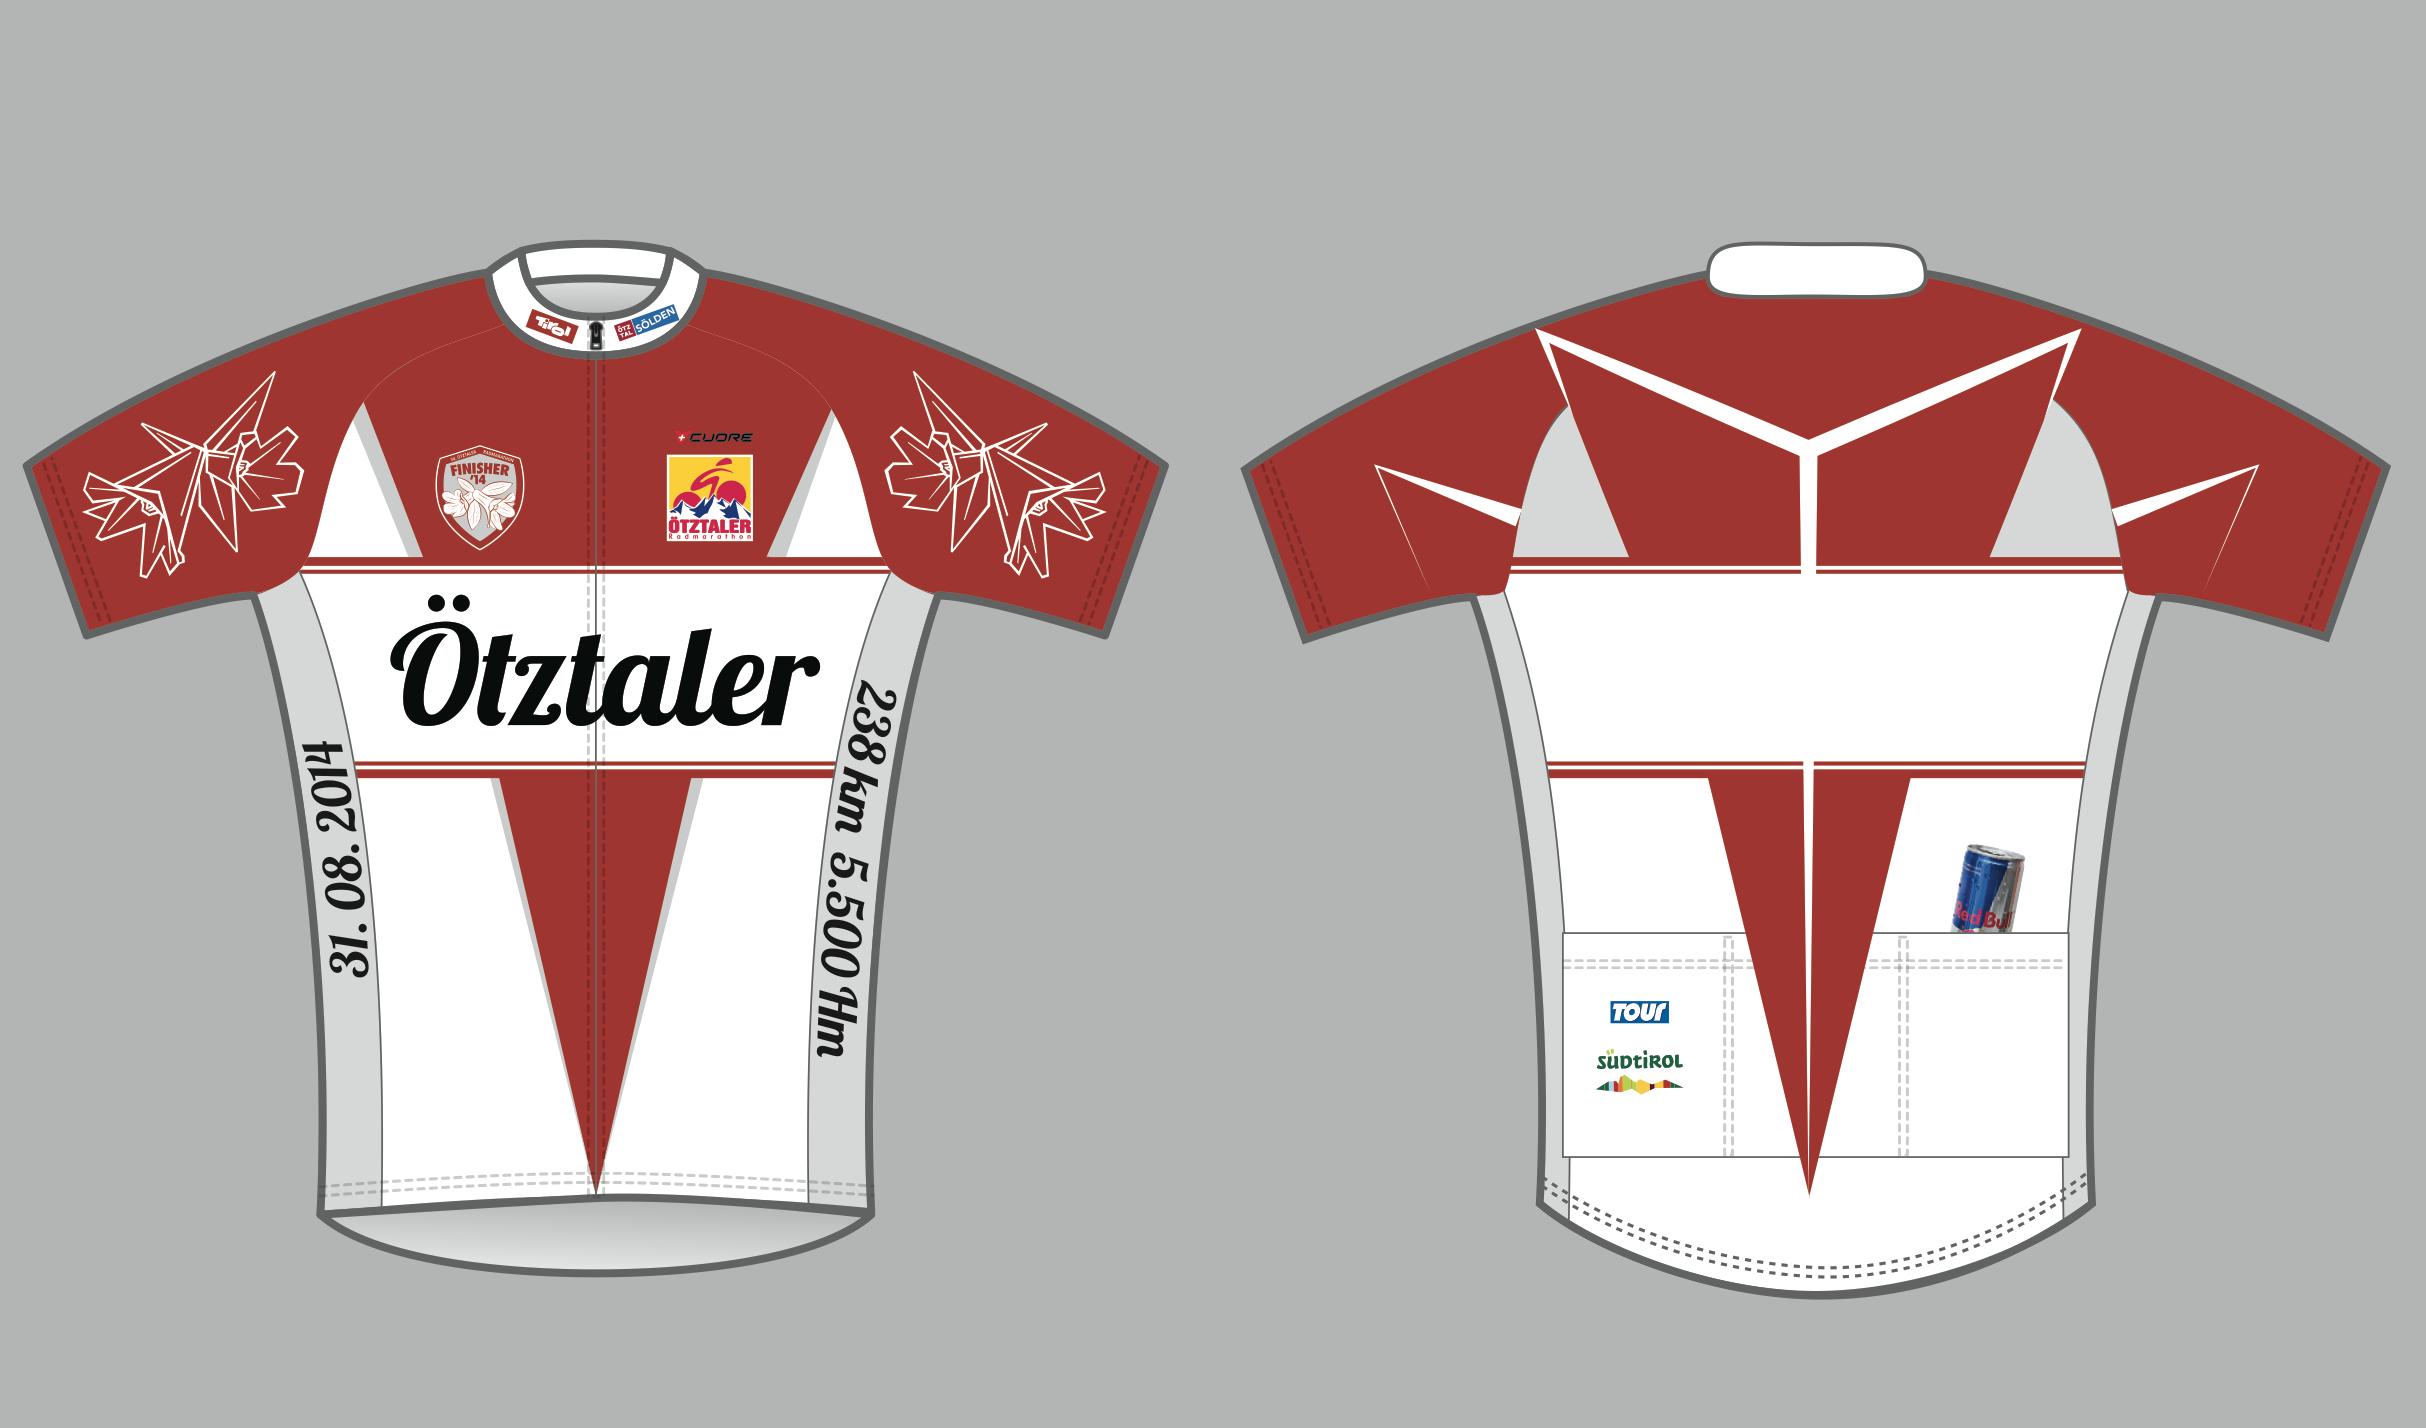 Ötztaler Radmarathon – ancora 18 giorni per iscriversi!